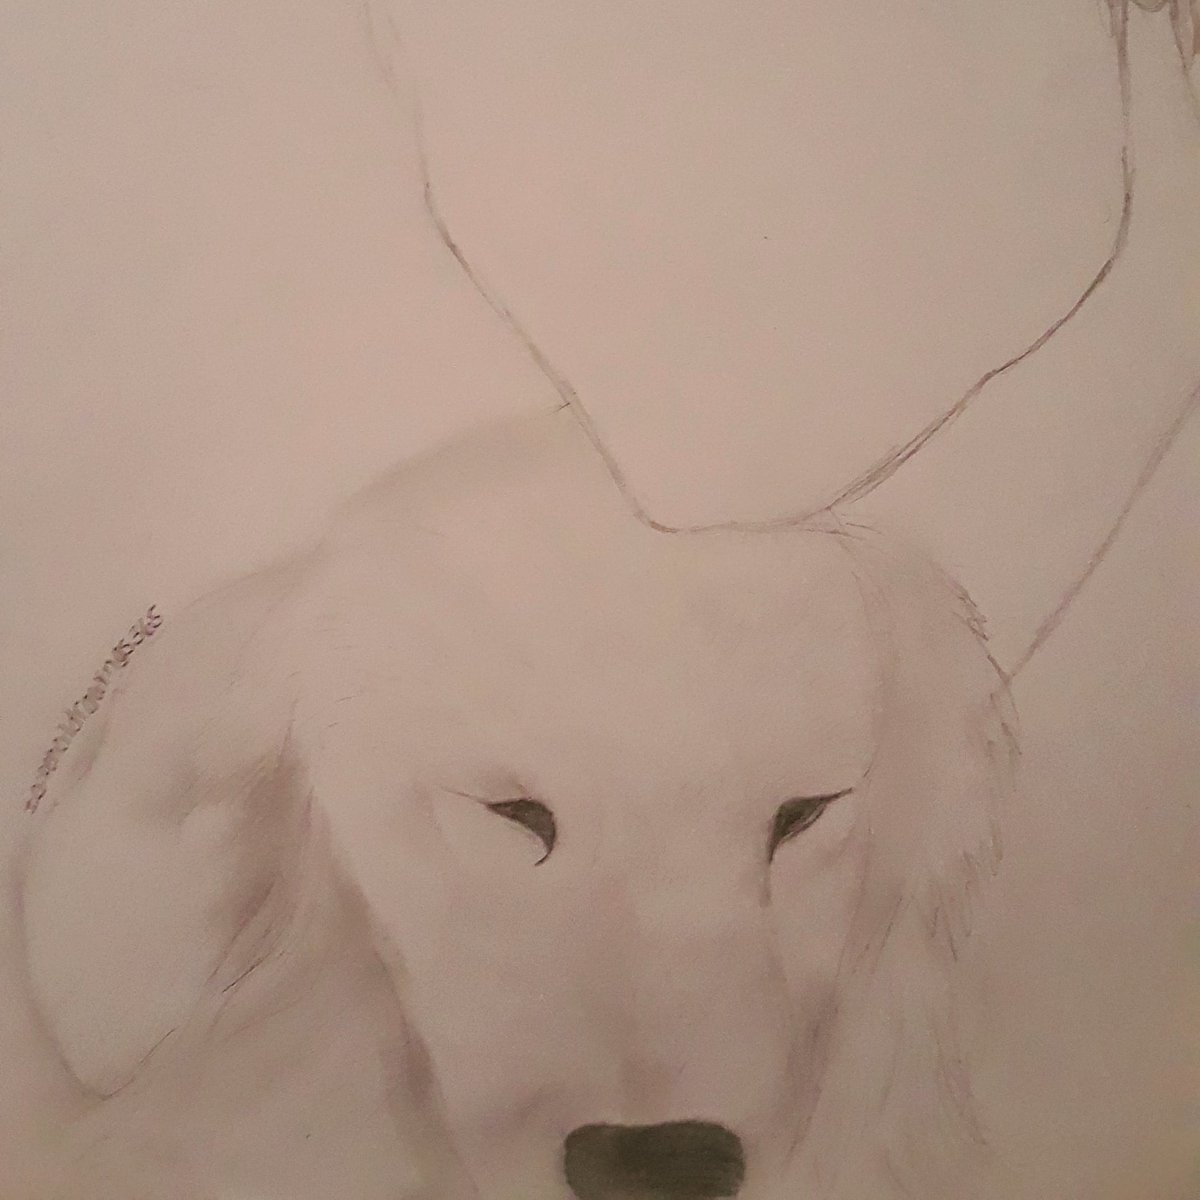 In progress , I'm not really good at animals lol #art #drawimg #pencilartpic.twitter.com/VKOJc3sJfl